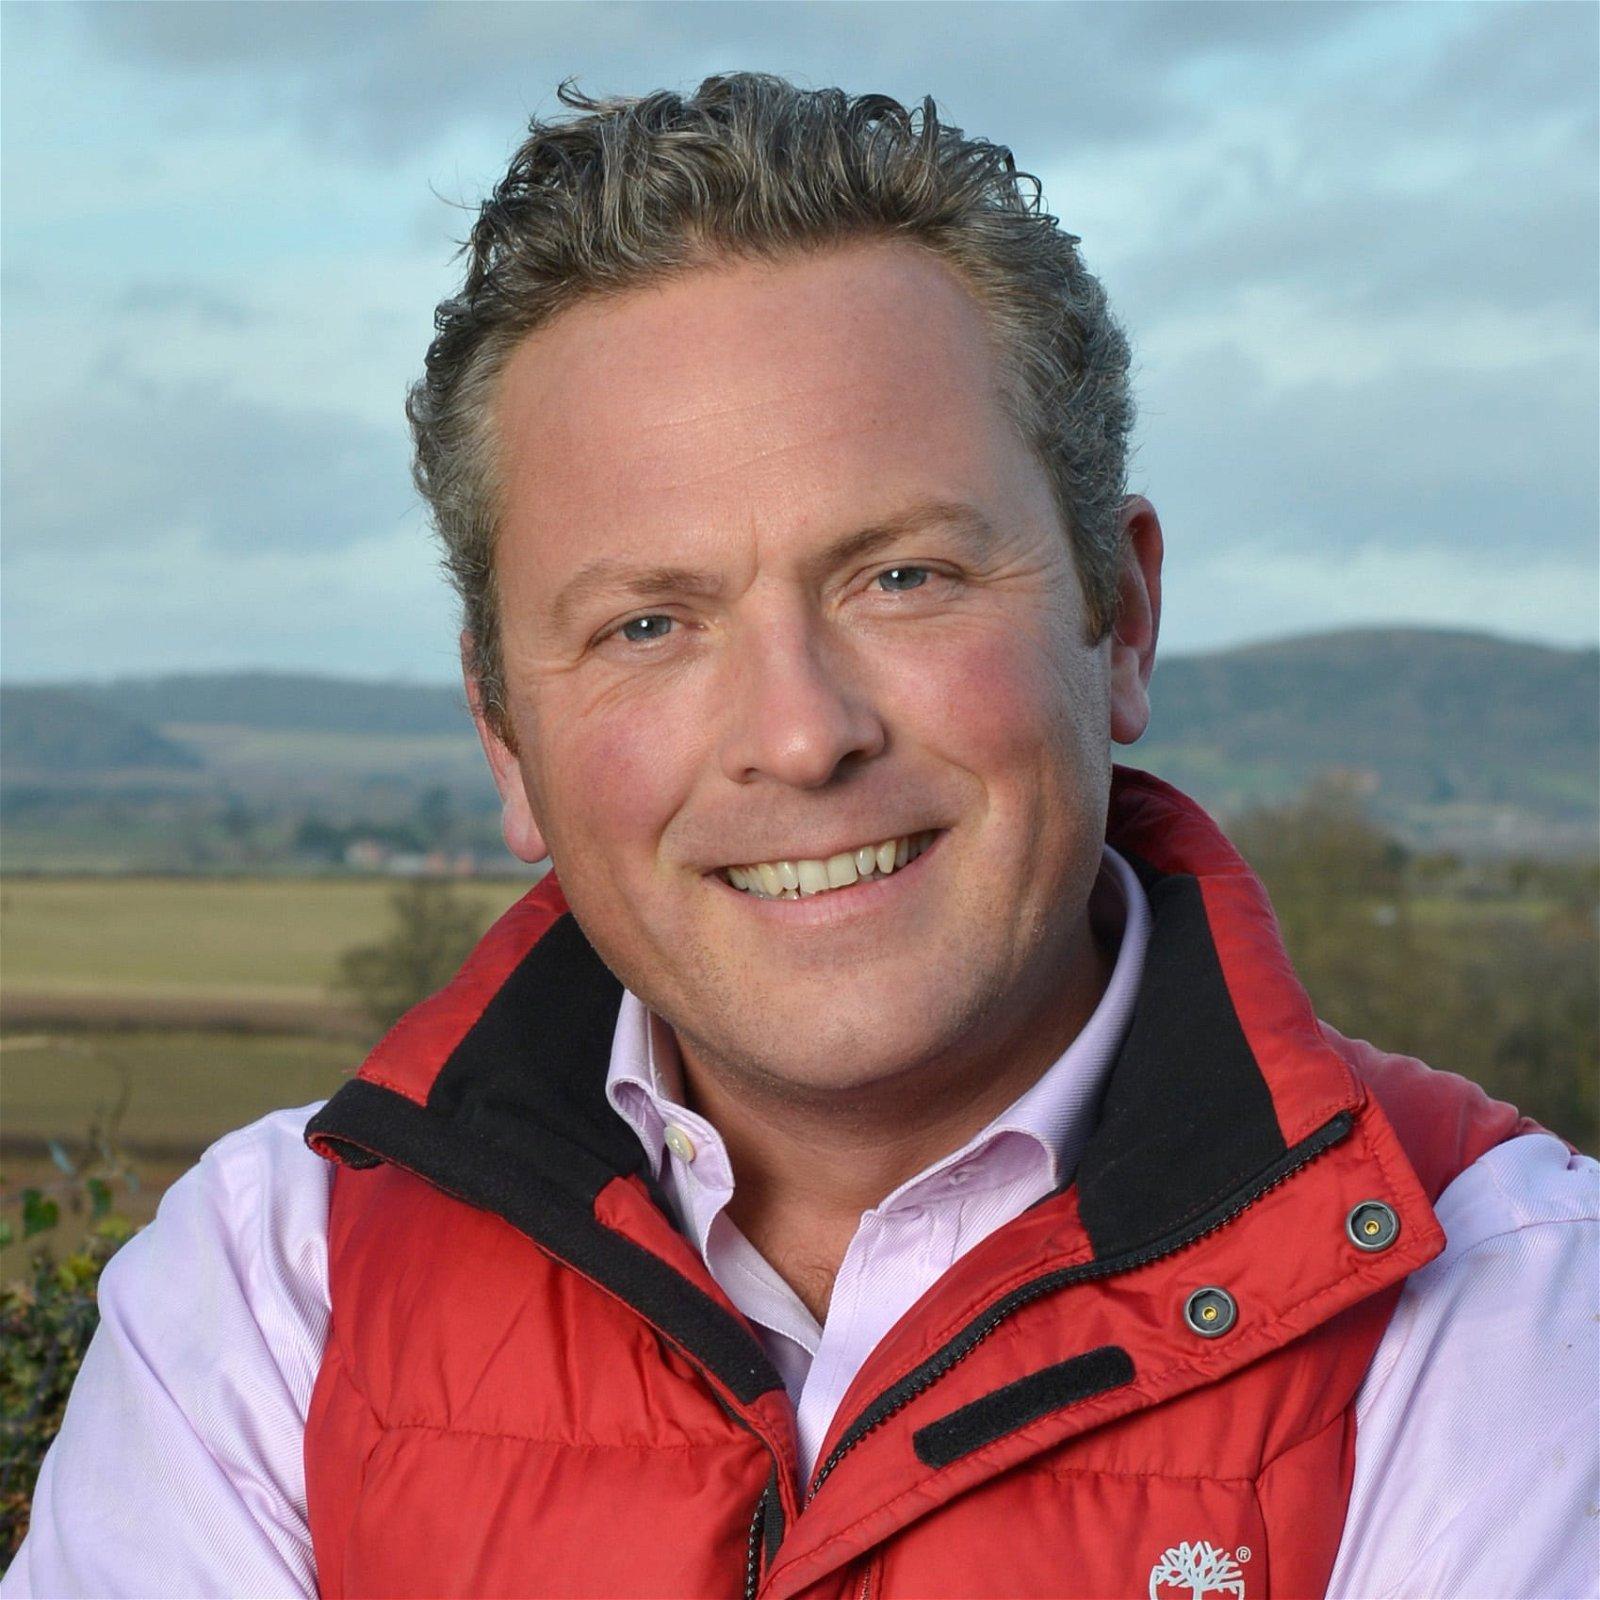 Jules-Hudson-property-rural-affairs-speaker-host-at-Great-British-Speakers